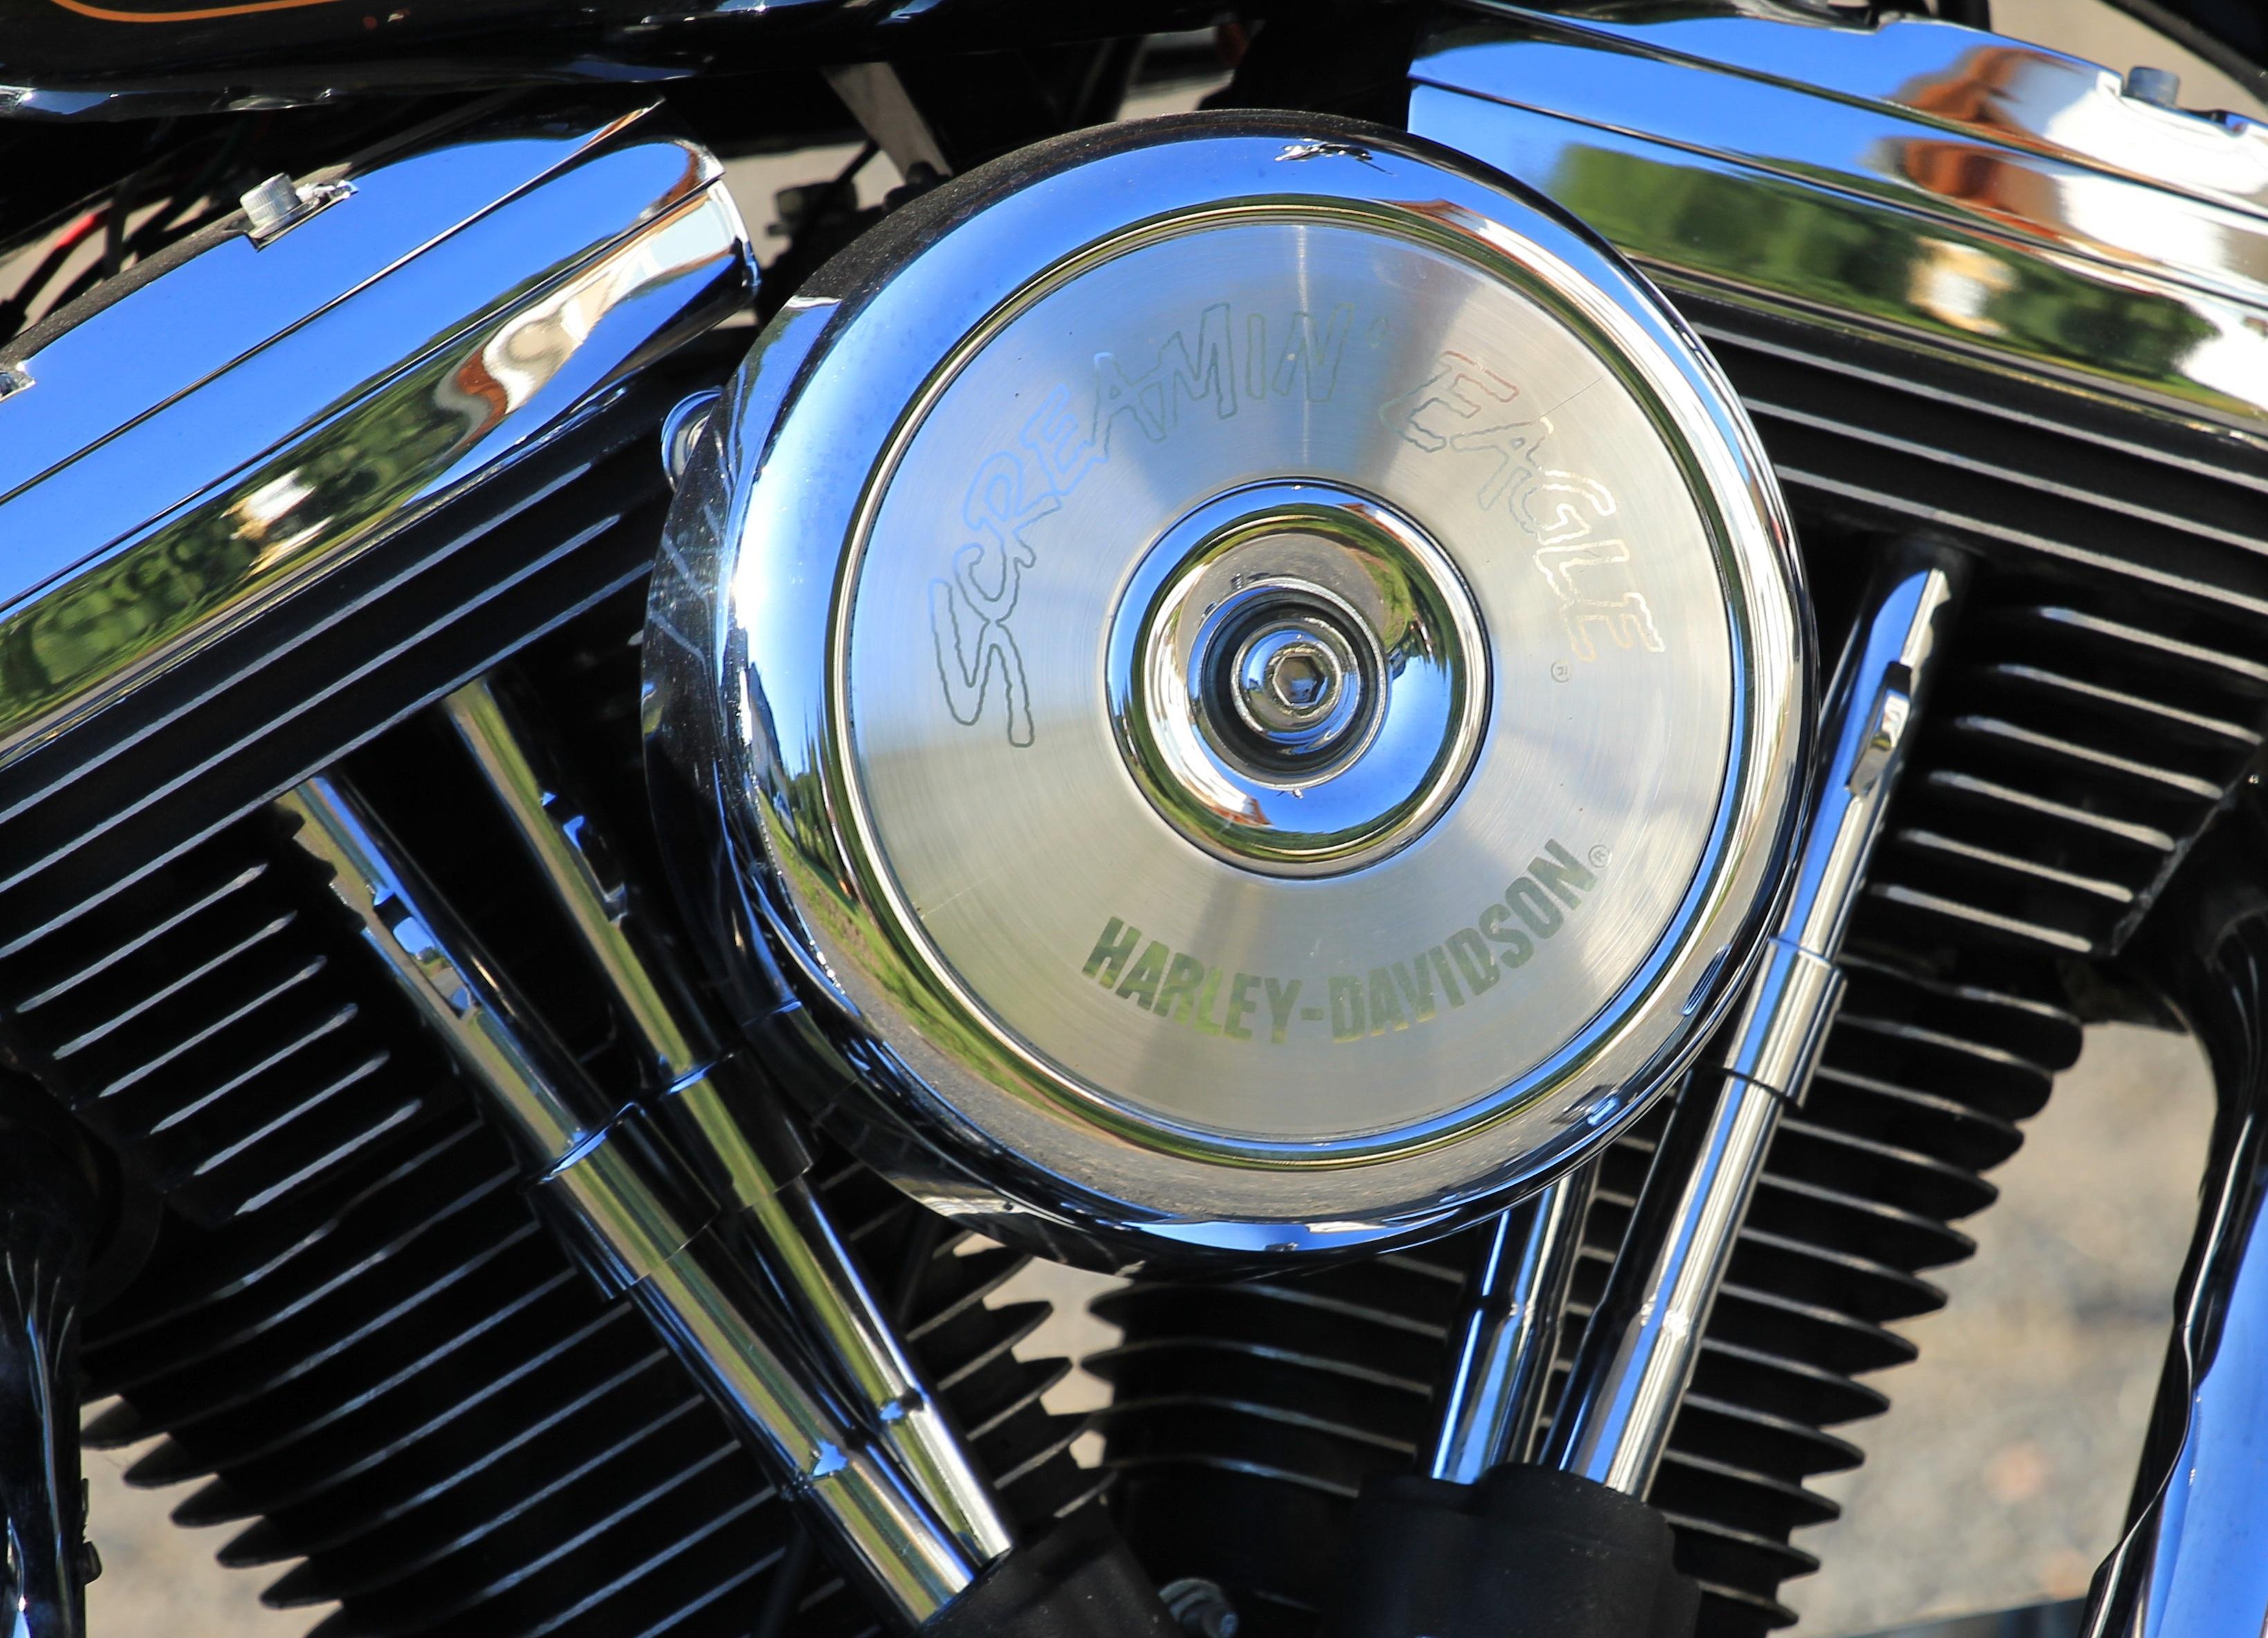 kostenlose foto rad fahrzeug motorrad metall usa. Black Bedroom Furniture Sets. Home Design Ideas